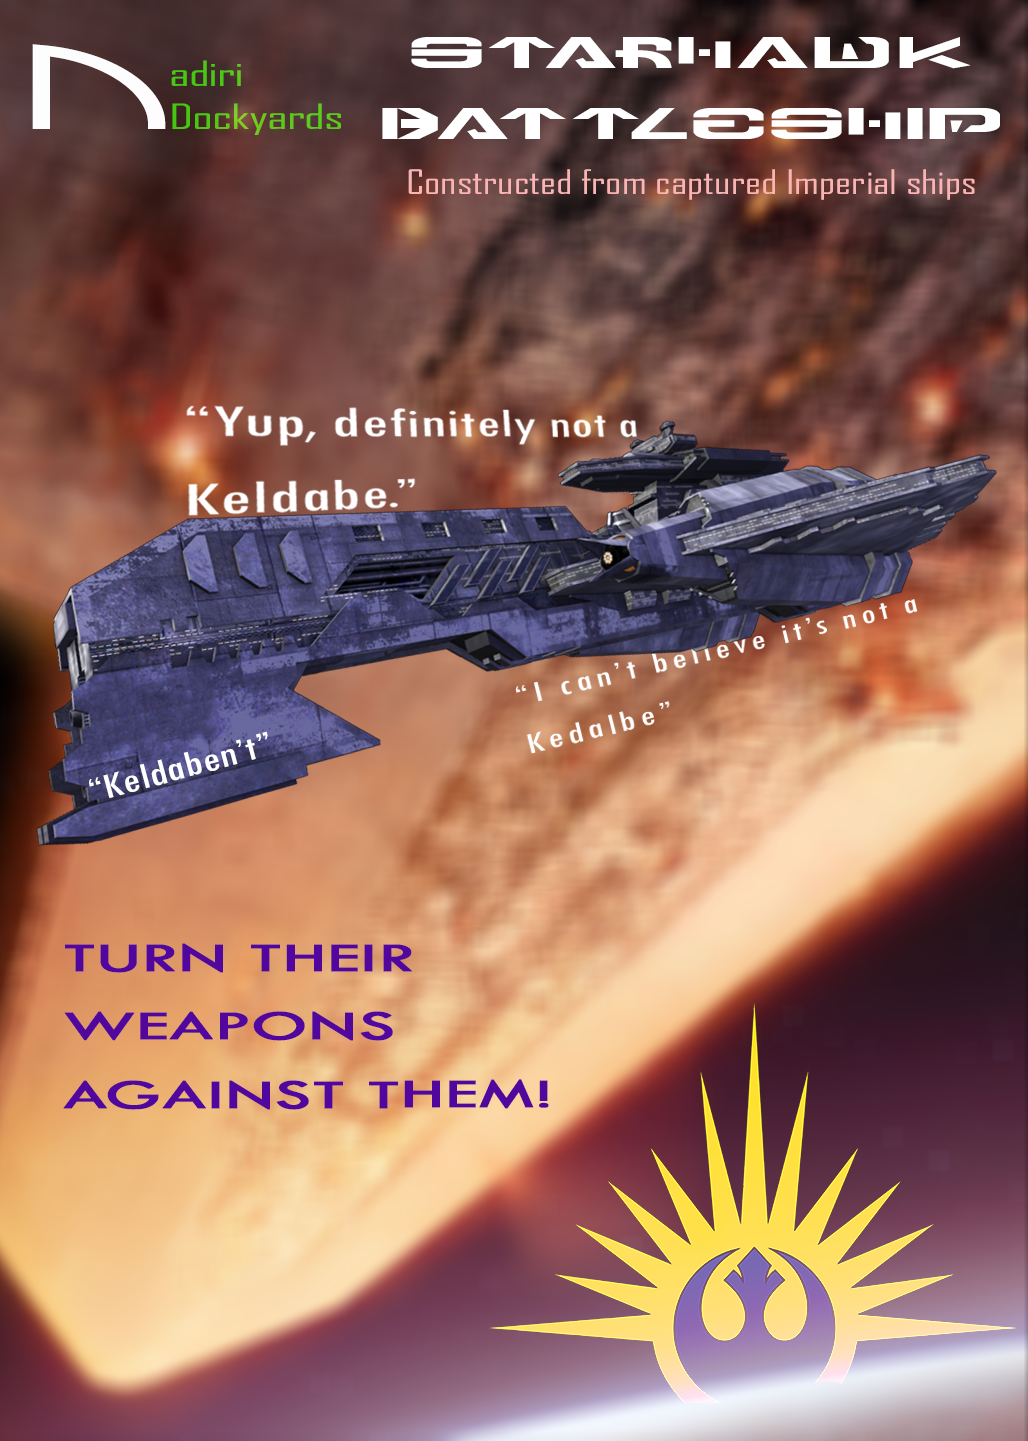 Starhawk Ad